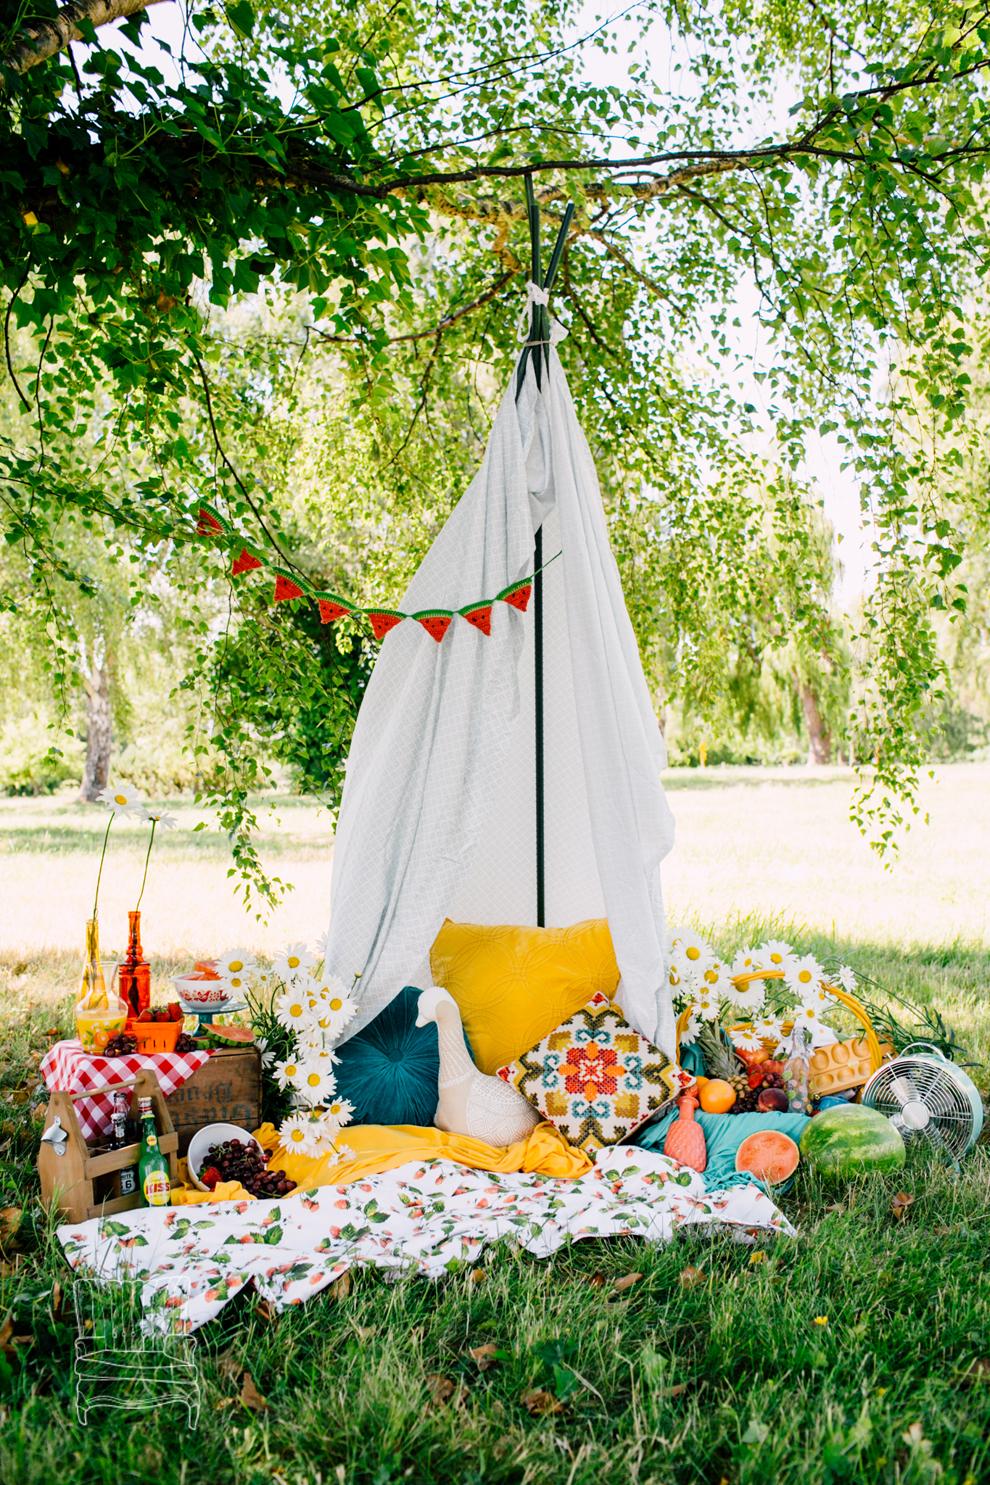 001-bellingham-summer-mini-session-fruity-styled-katheryn-moran-photography.jpg